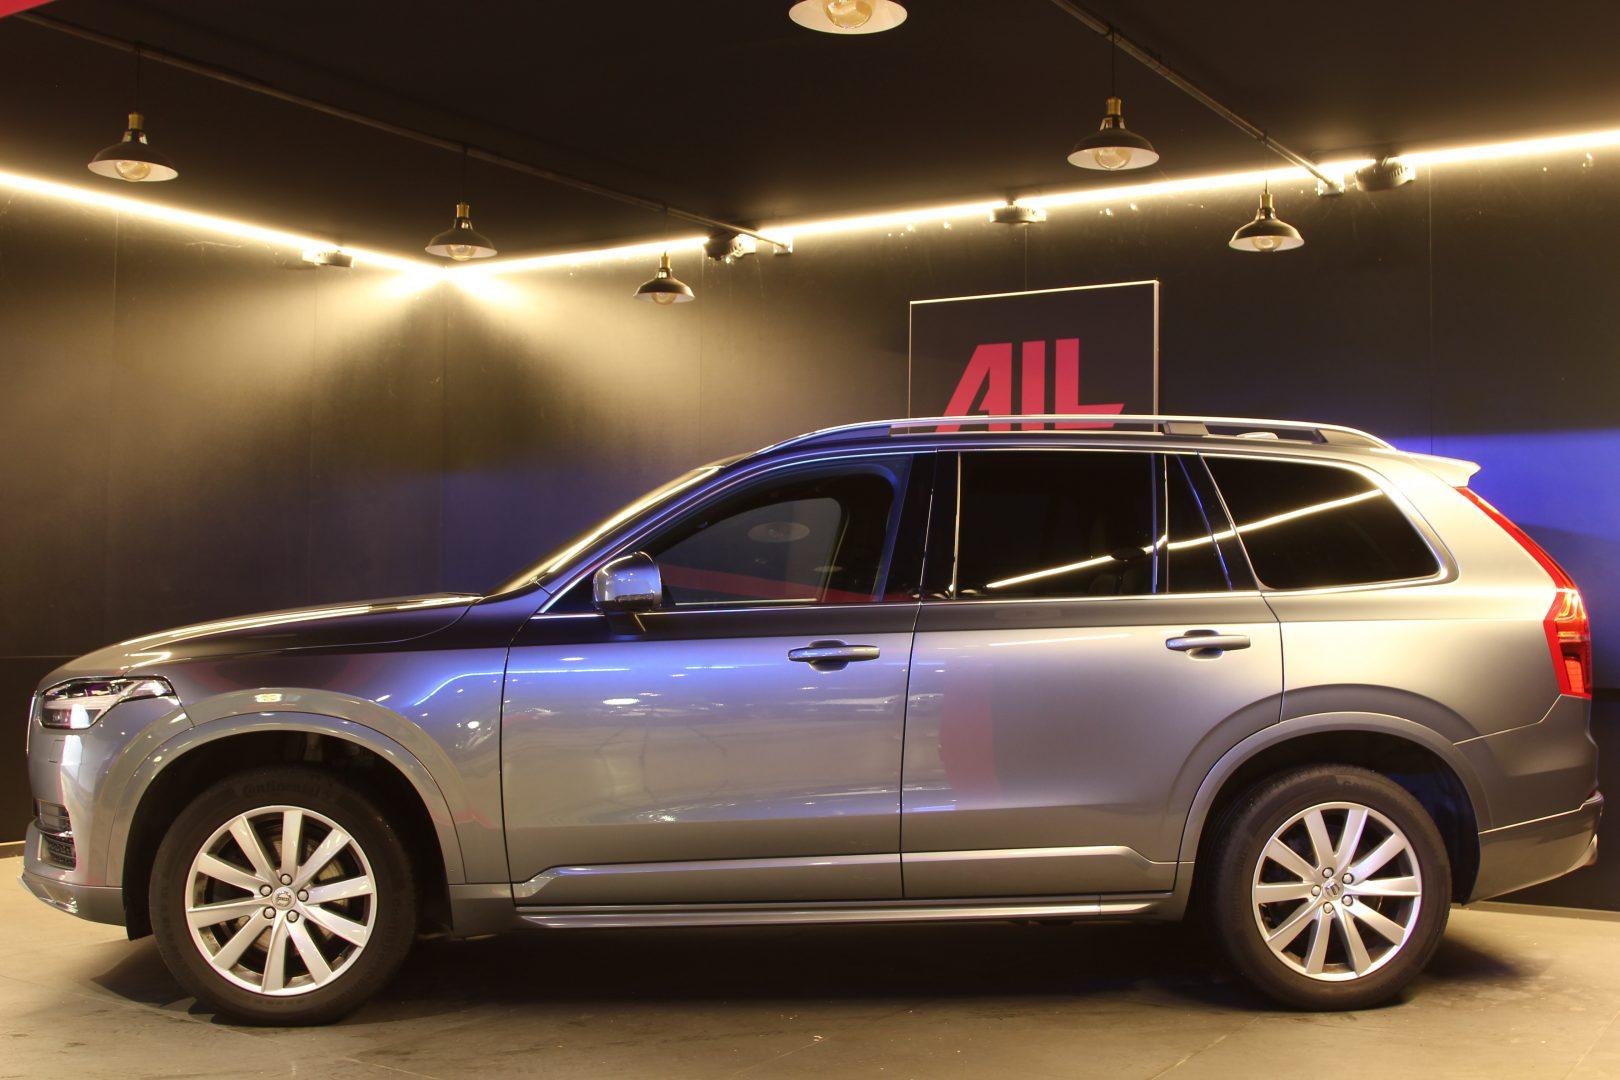 AIL Volvo XC 90 Momentum AWD 3